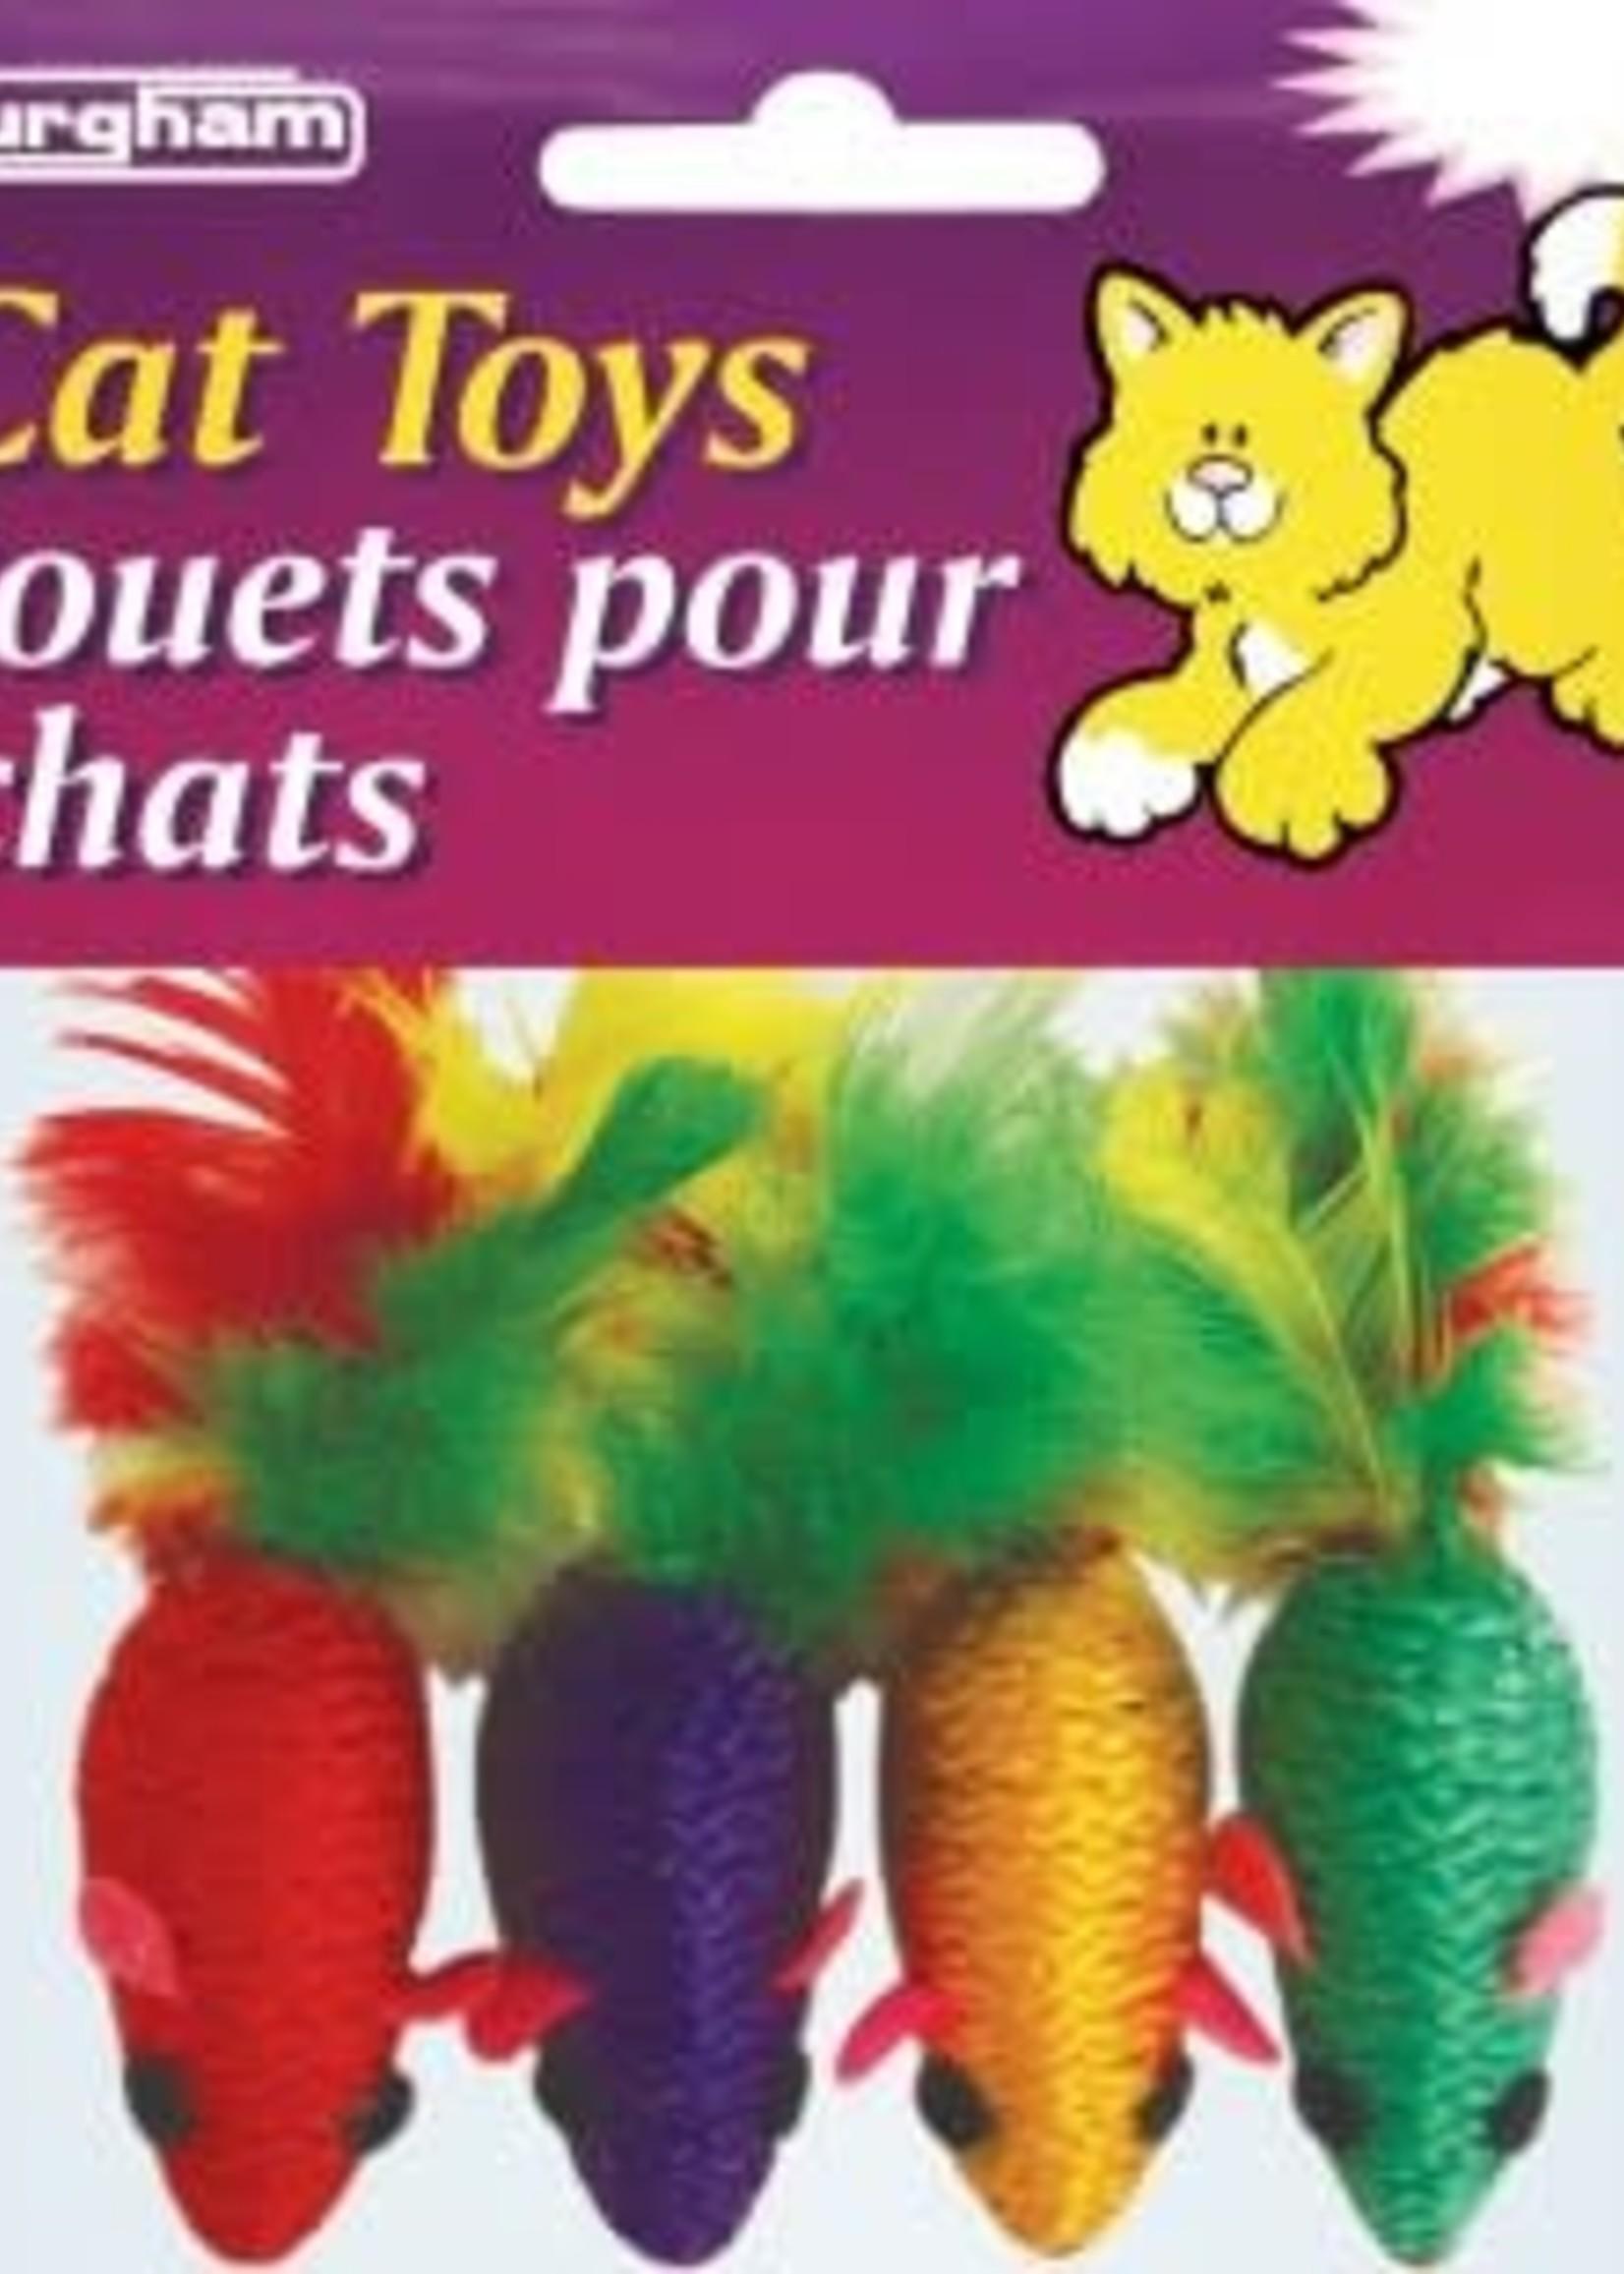 Burgham Cat Toys BURG CatToy RopeMouse/4